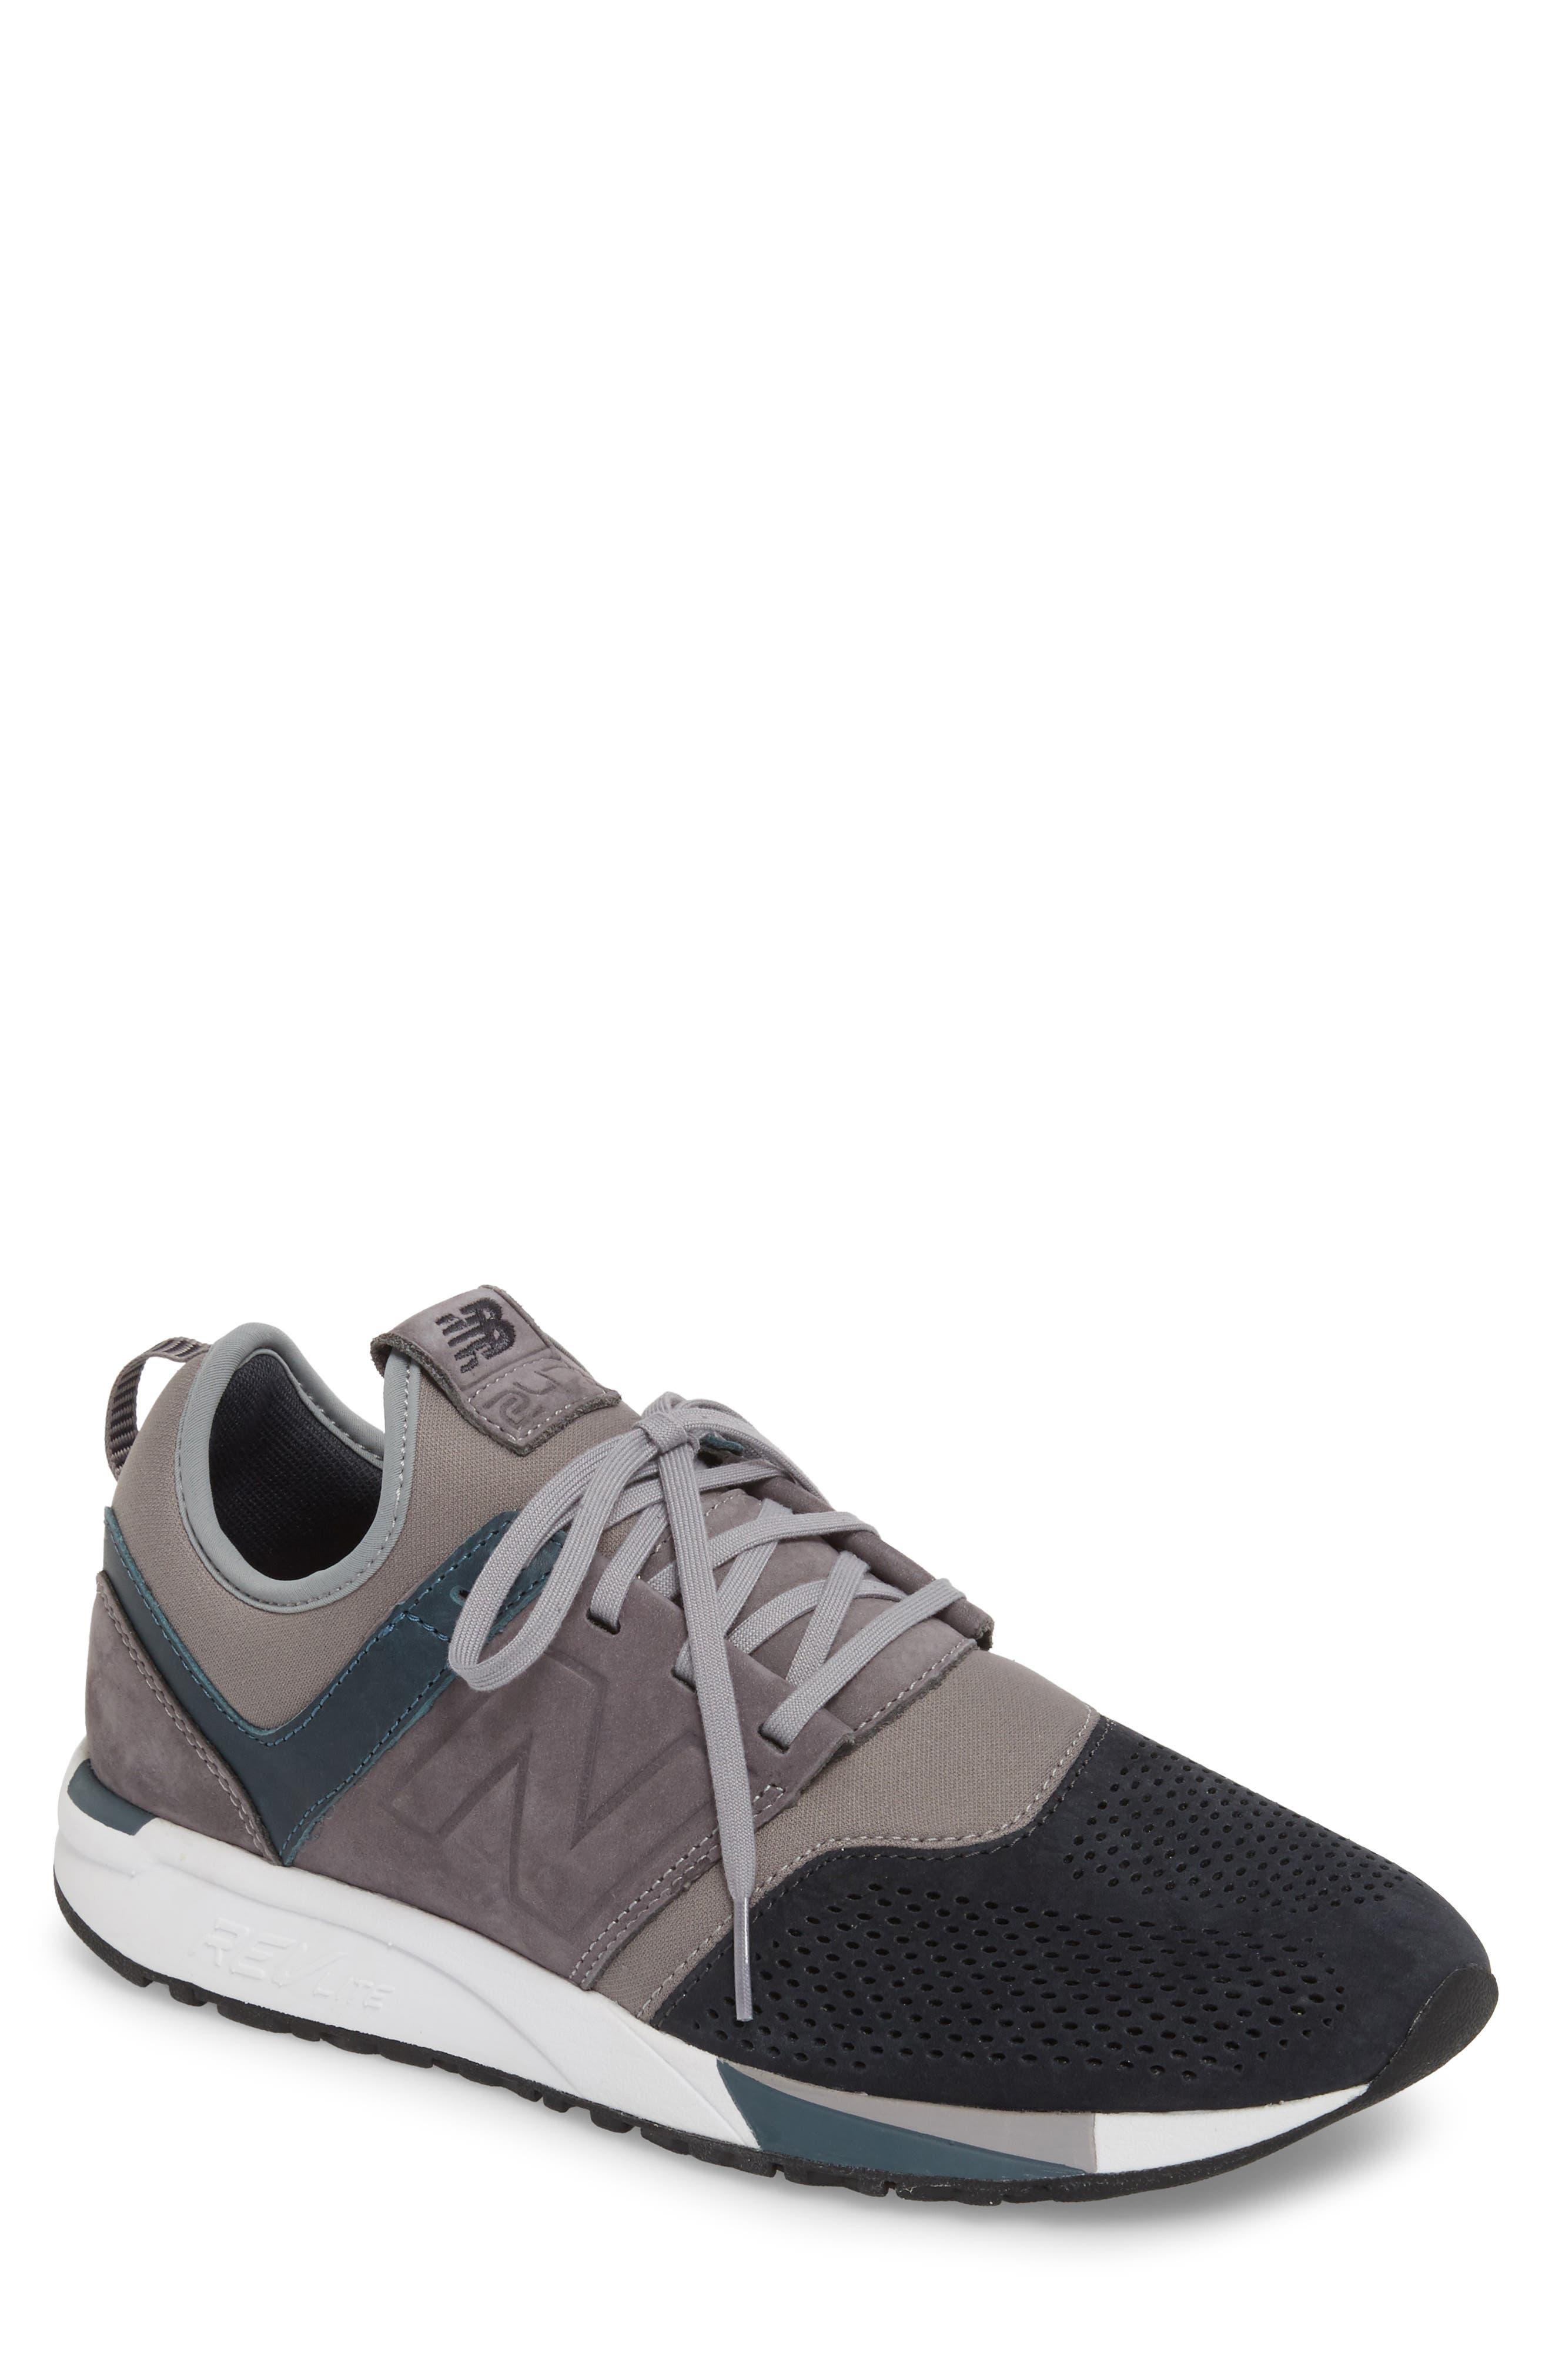 Main Image - New Balance 274 Luxe Sneaker (Men)